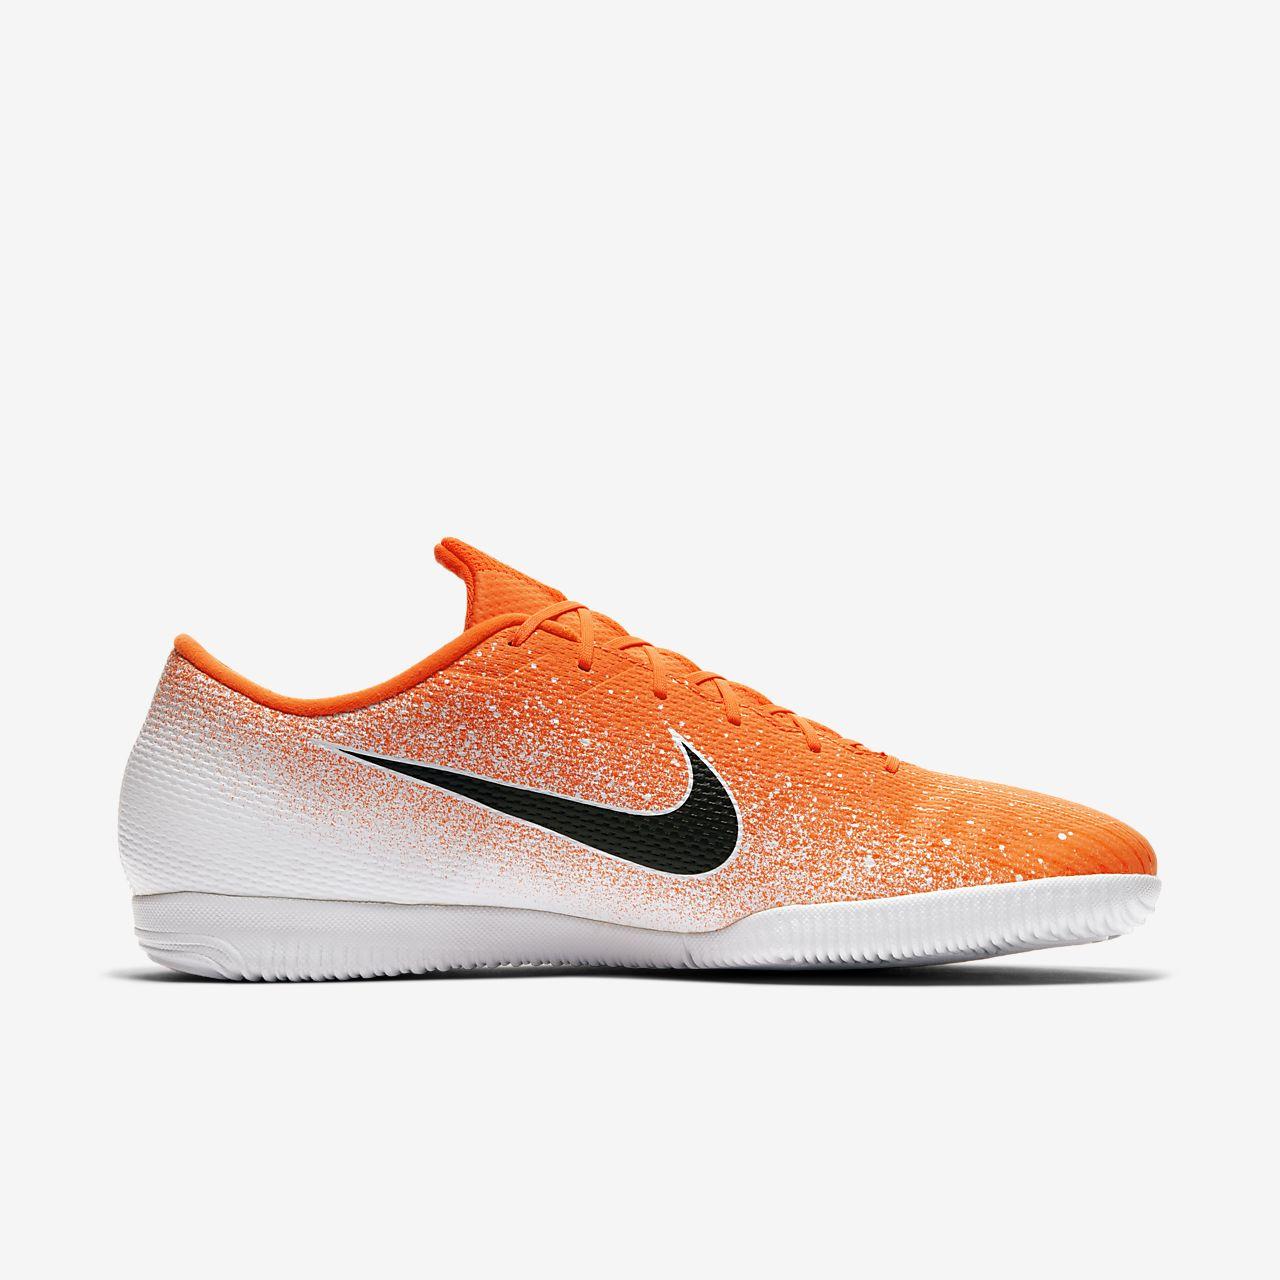 06c4f08f3 Nike VaporX 12 Academy IC Indoor Court Football Shoe. Nike.com CA